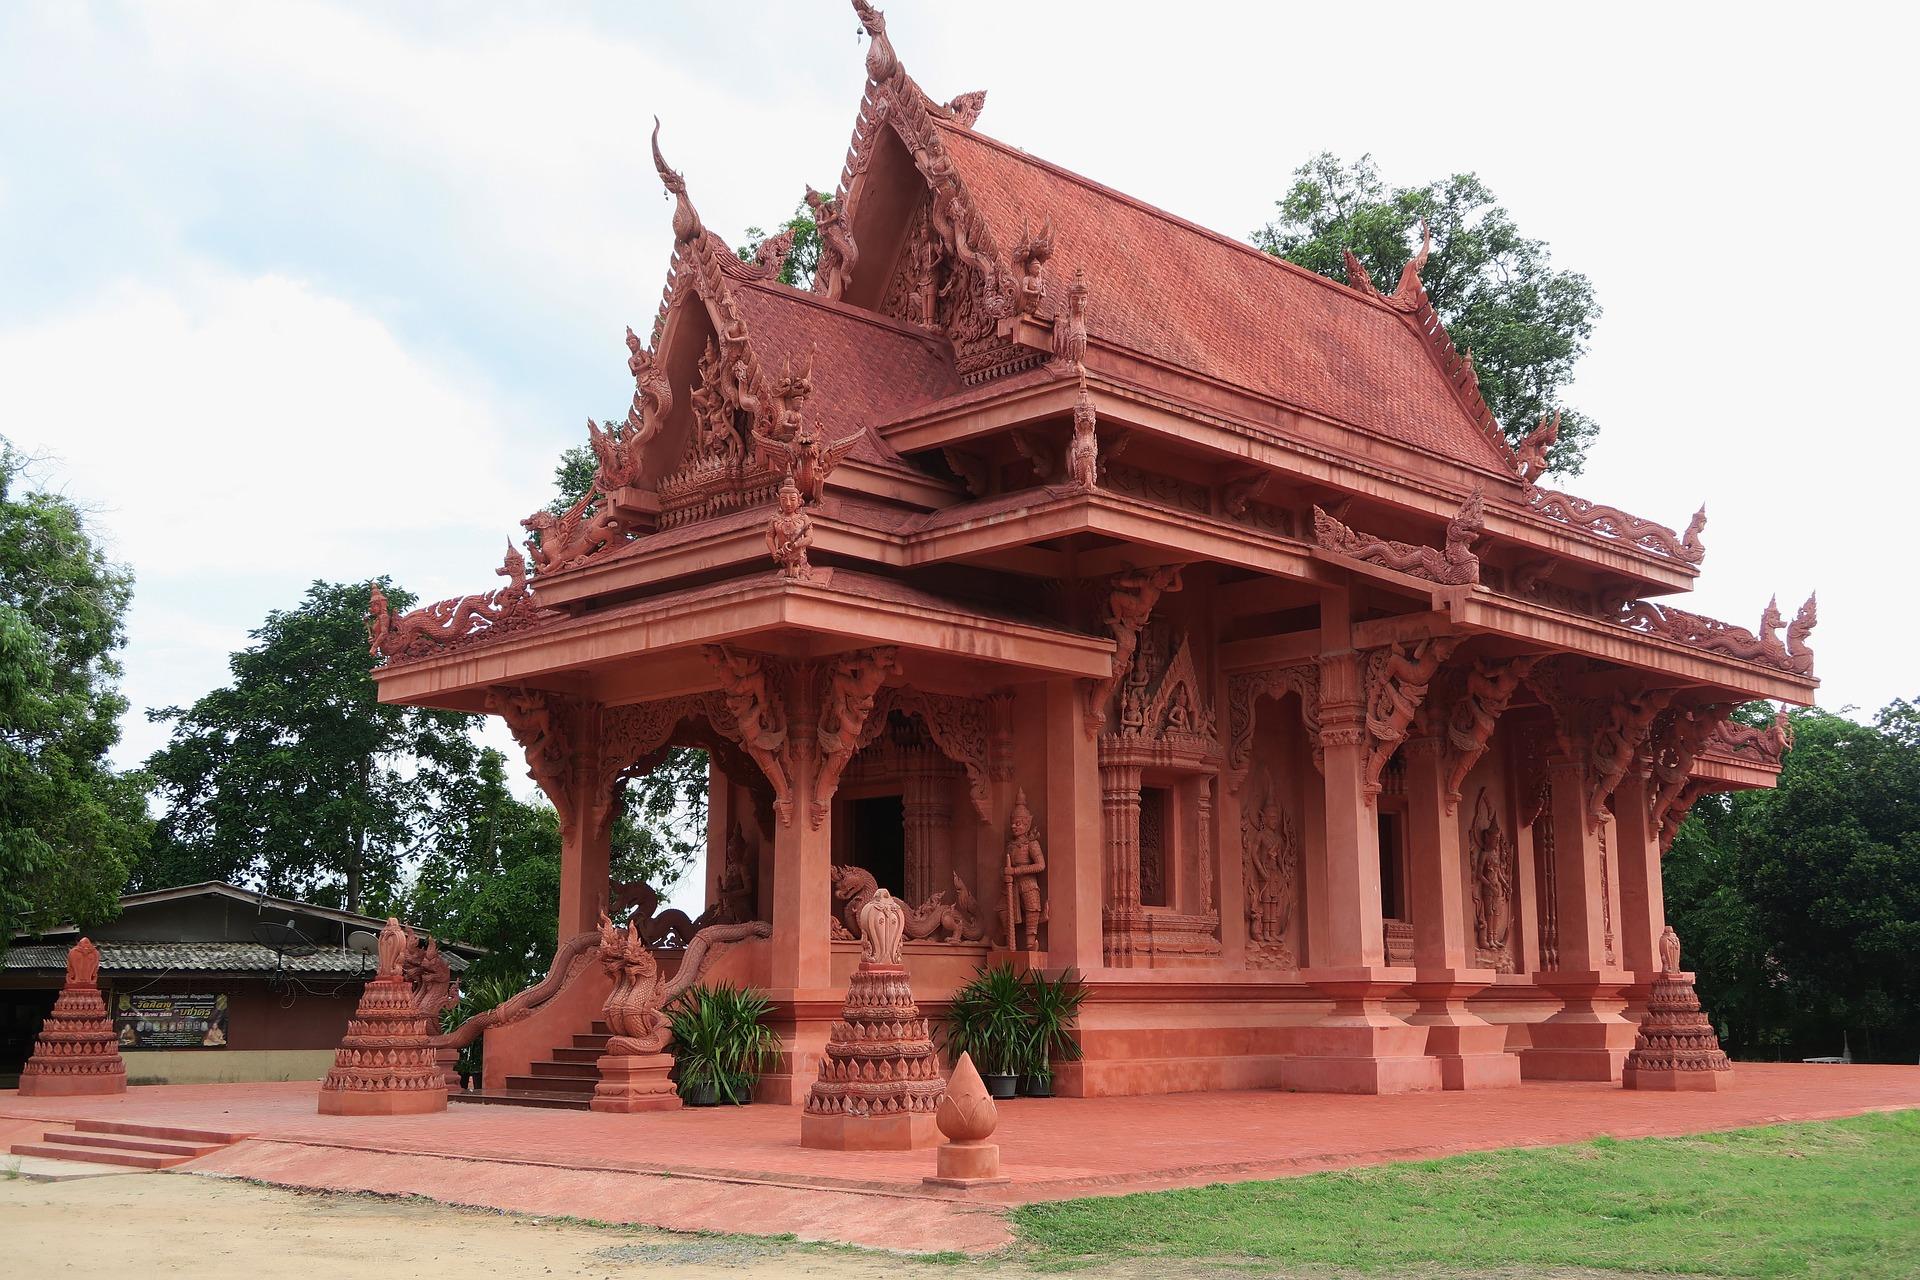 temple-1606365_1920